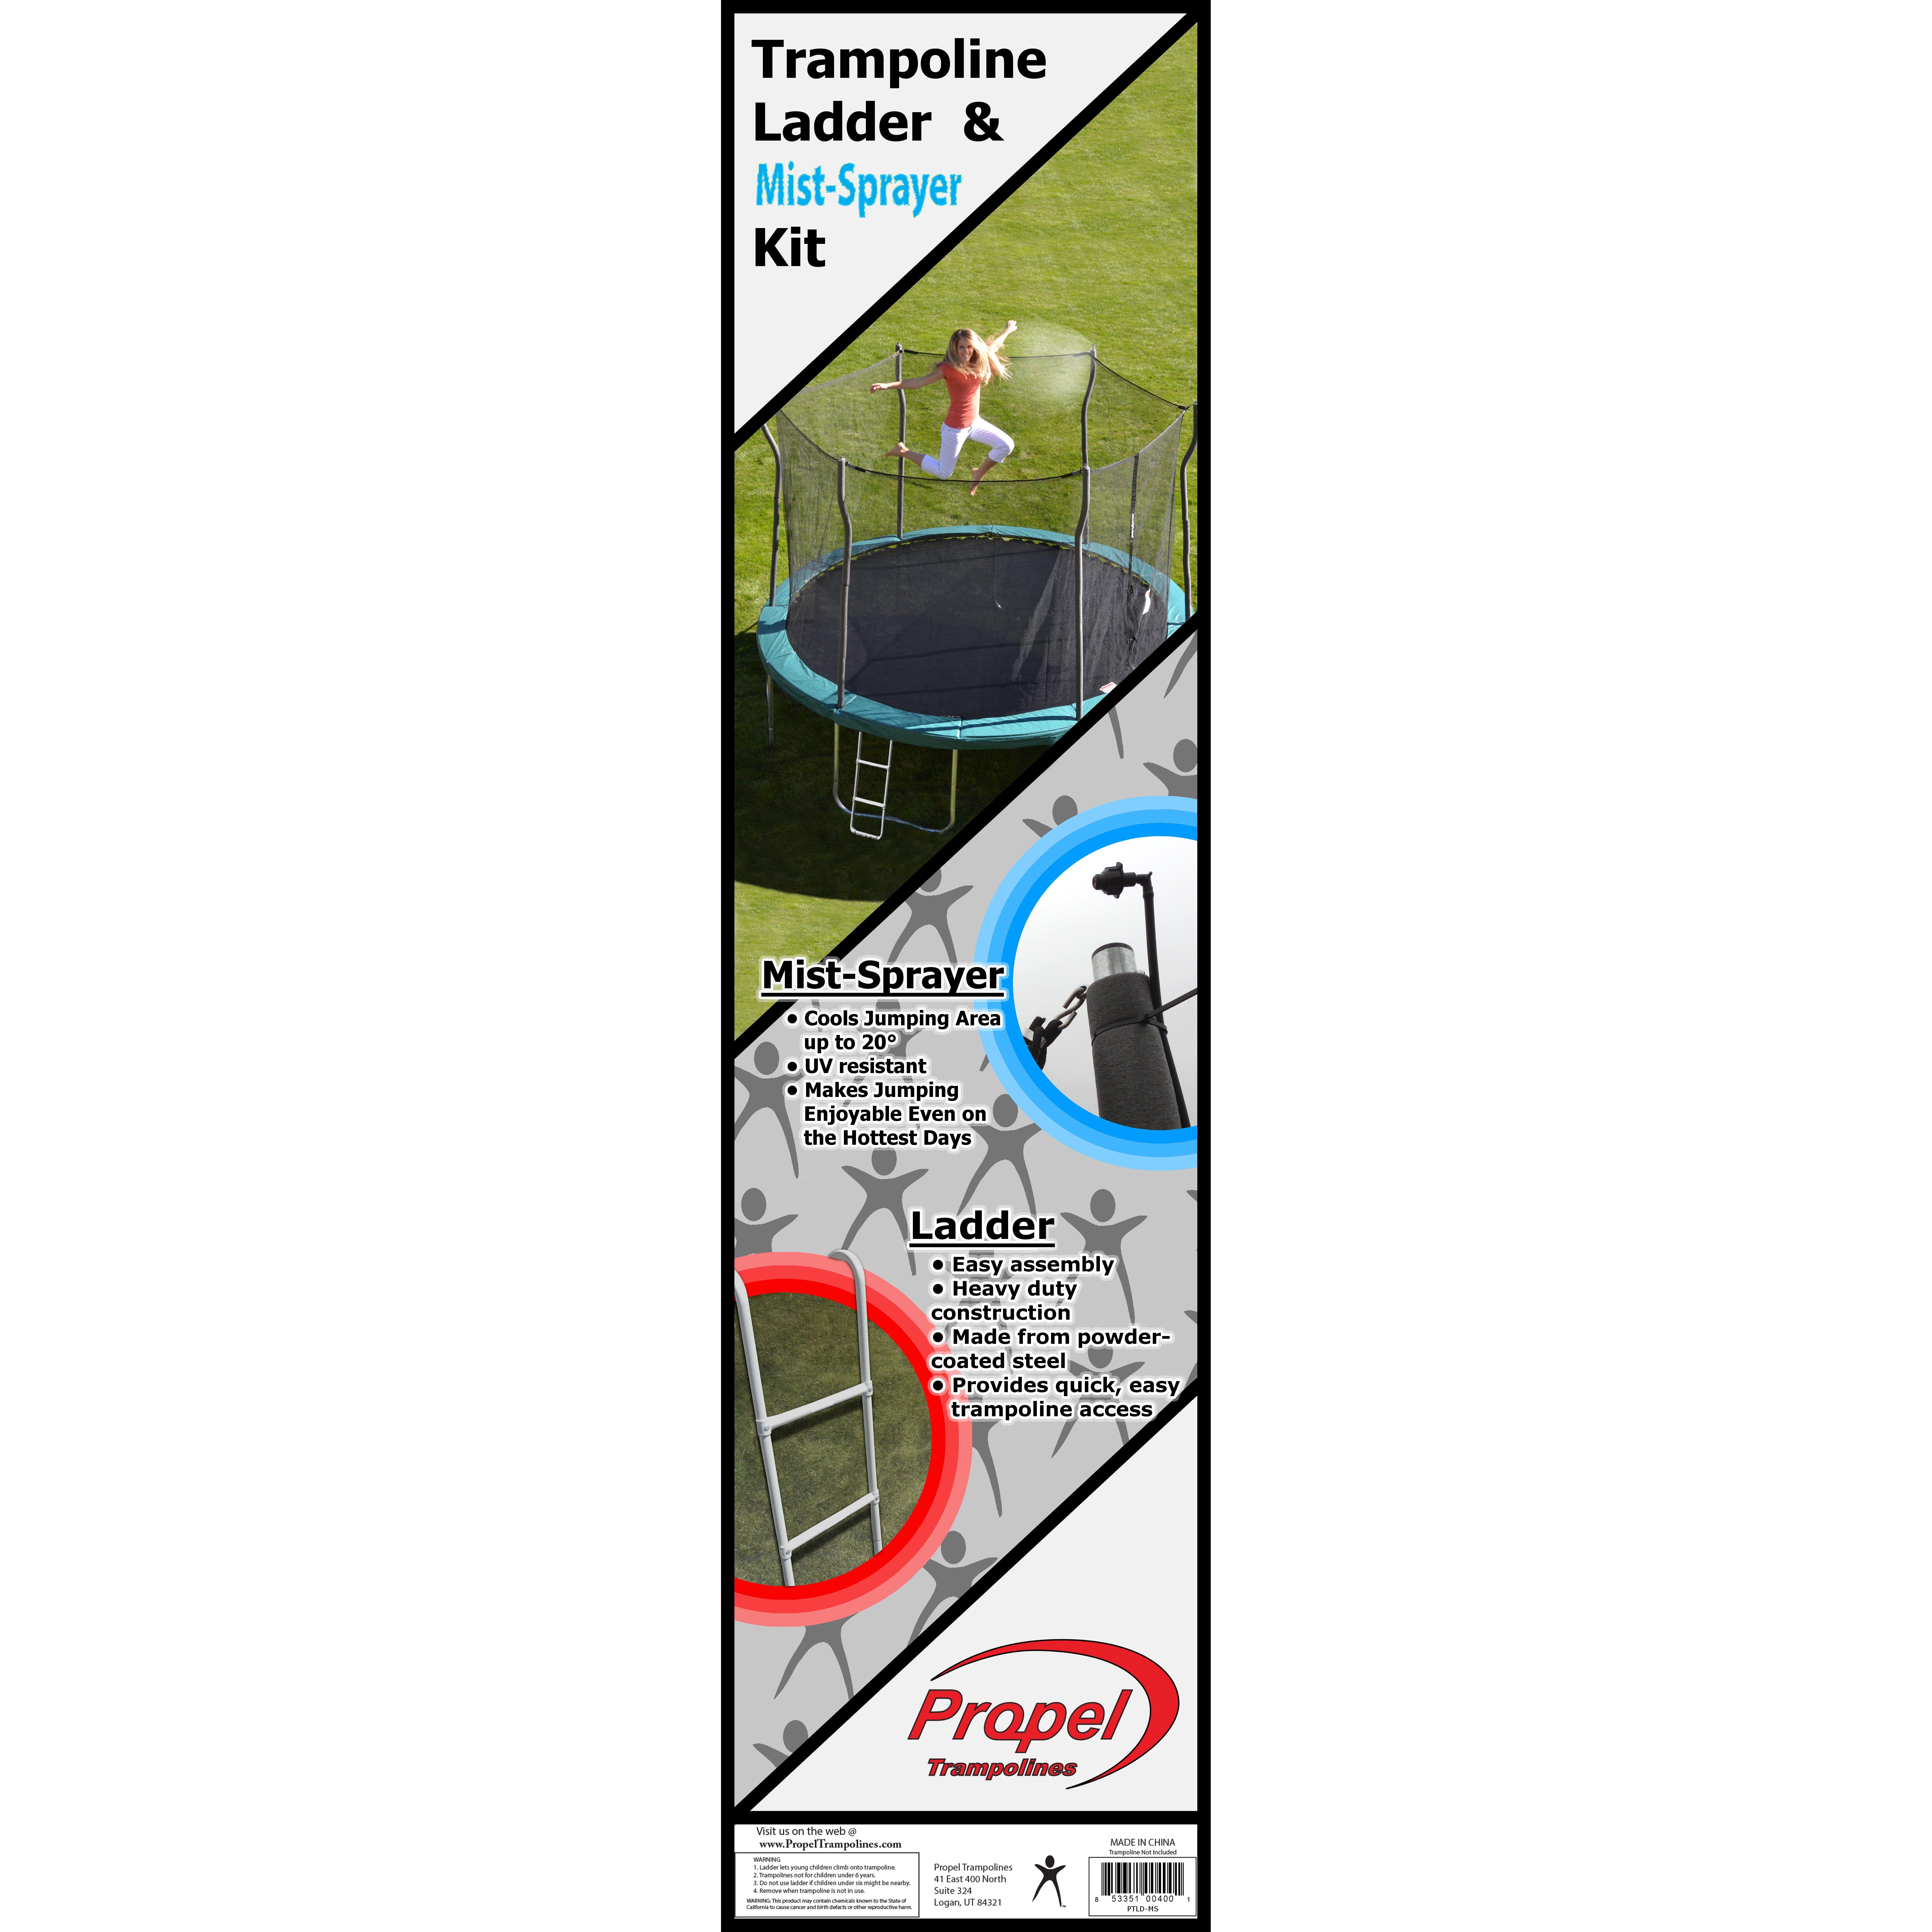 "Propel Trampolines 36"" Trampoline Ladder And Mister Kit"